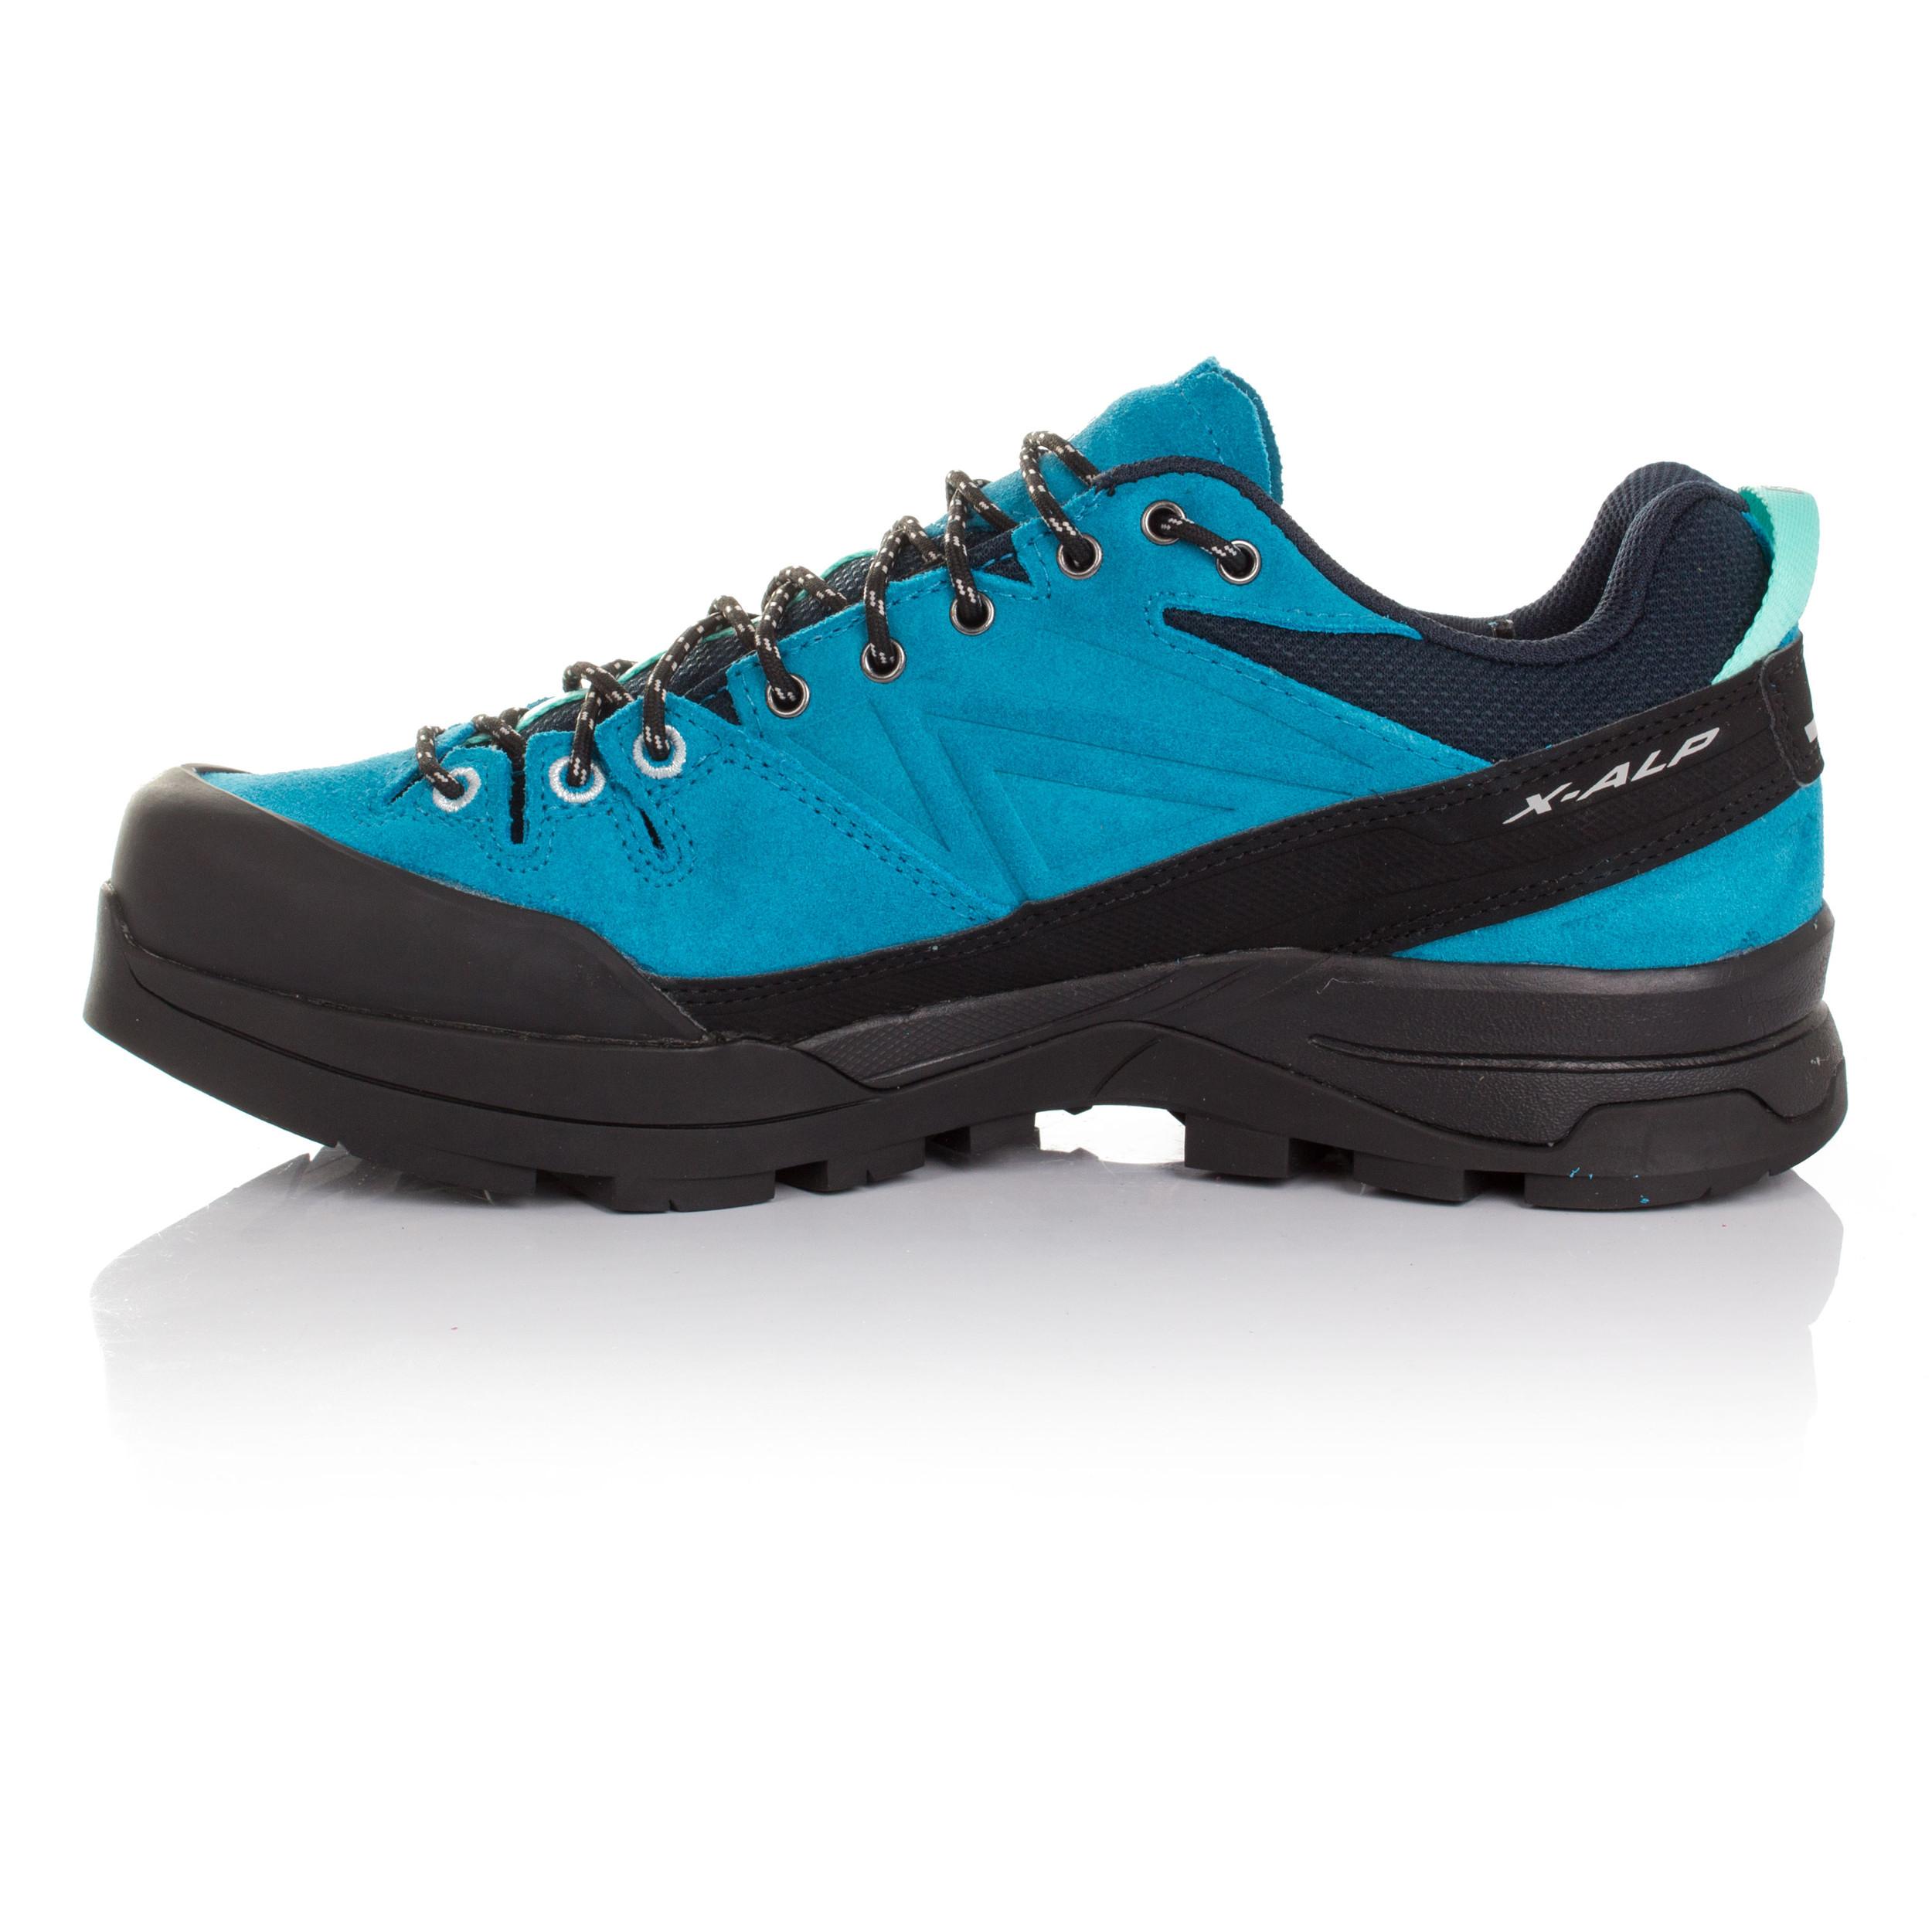 Salomon Shoes Womens Gore Tex